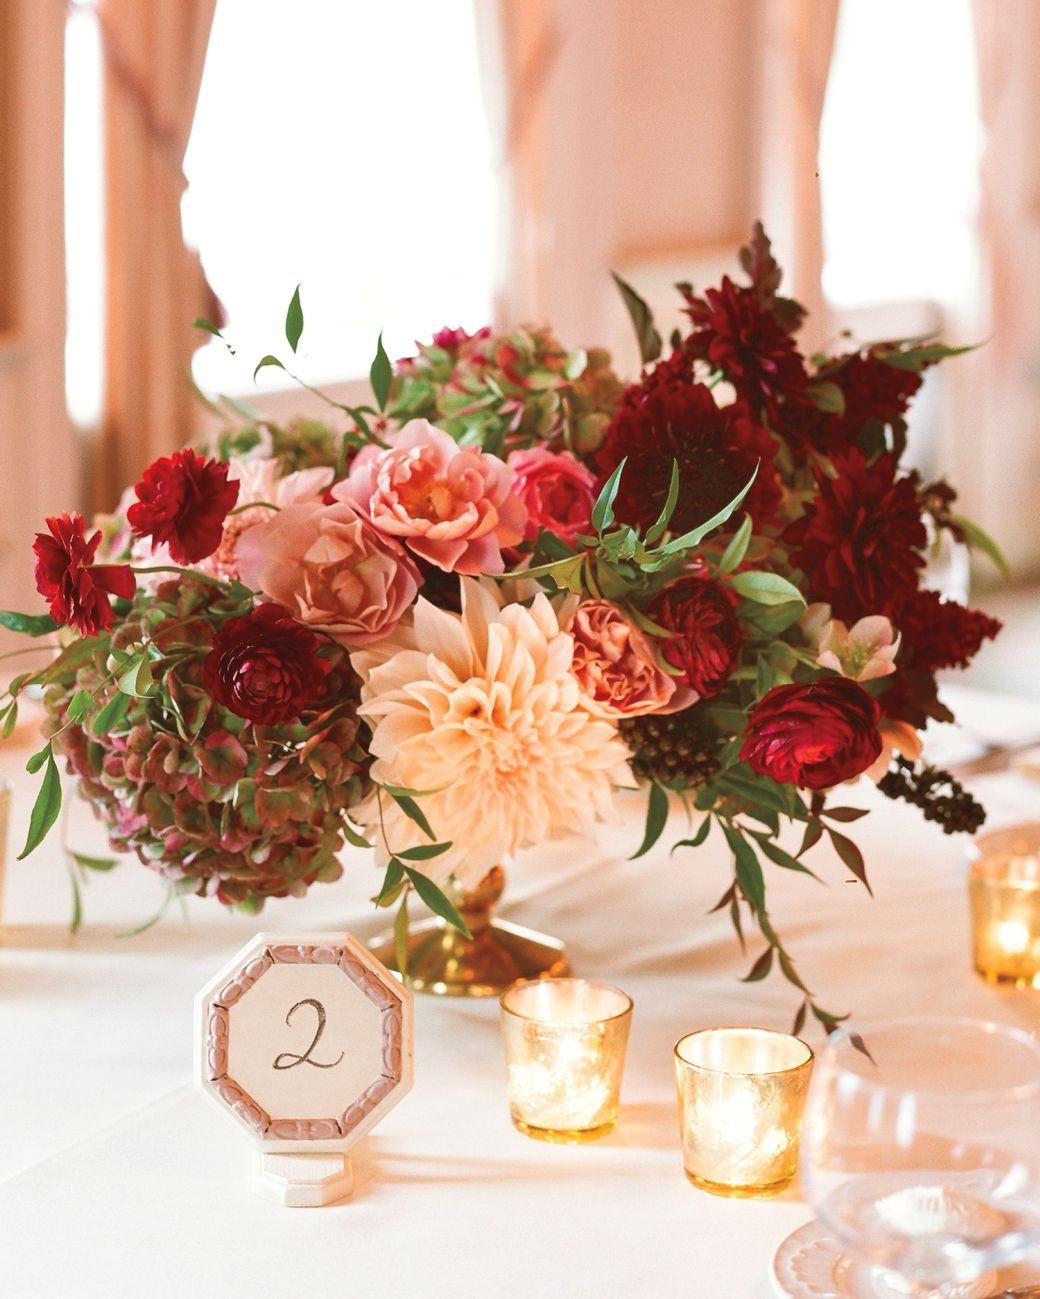 Wedding Flower Centerpieces Online: 6 Unique Fall Wedding Color Schemes